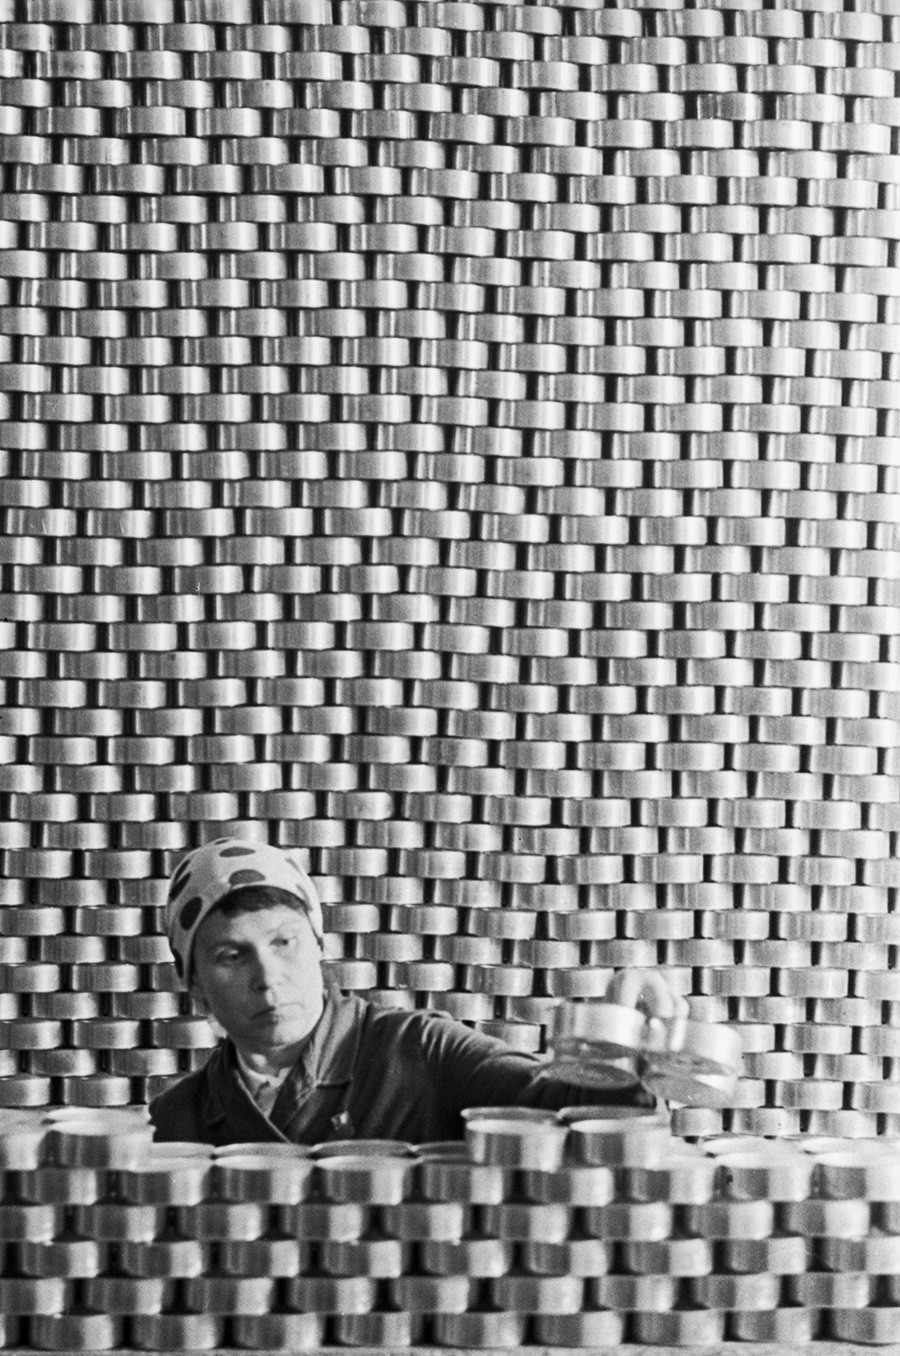 Inšpektor kakovosti v proizvodnji konzerv v Jamalo-Neneški ribji tovarni, 1972